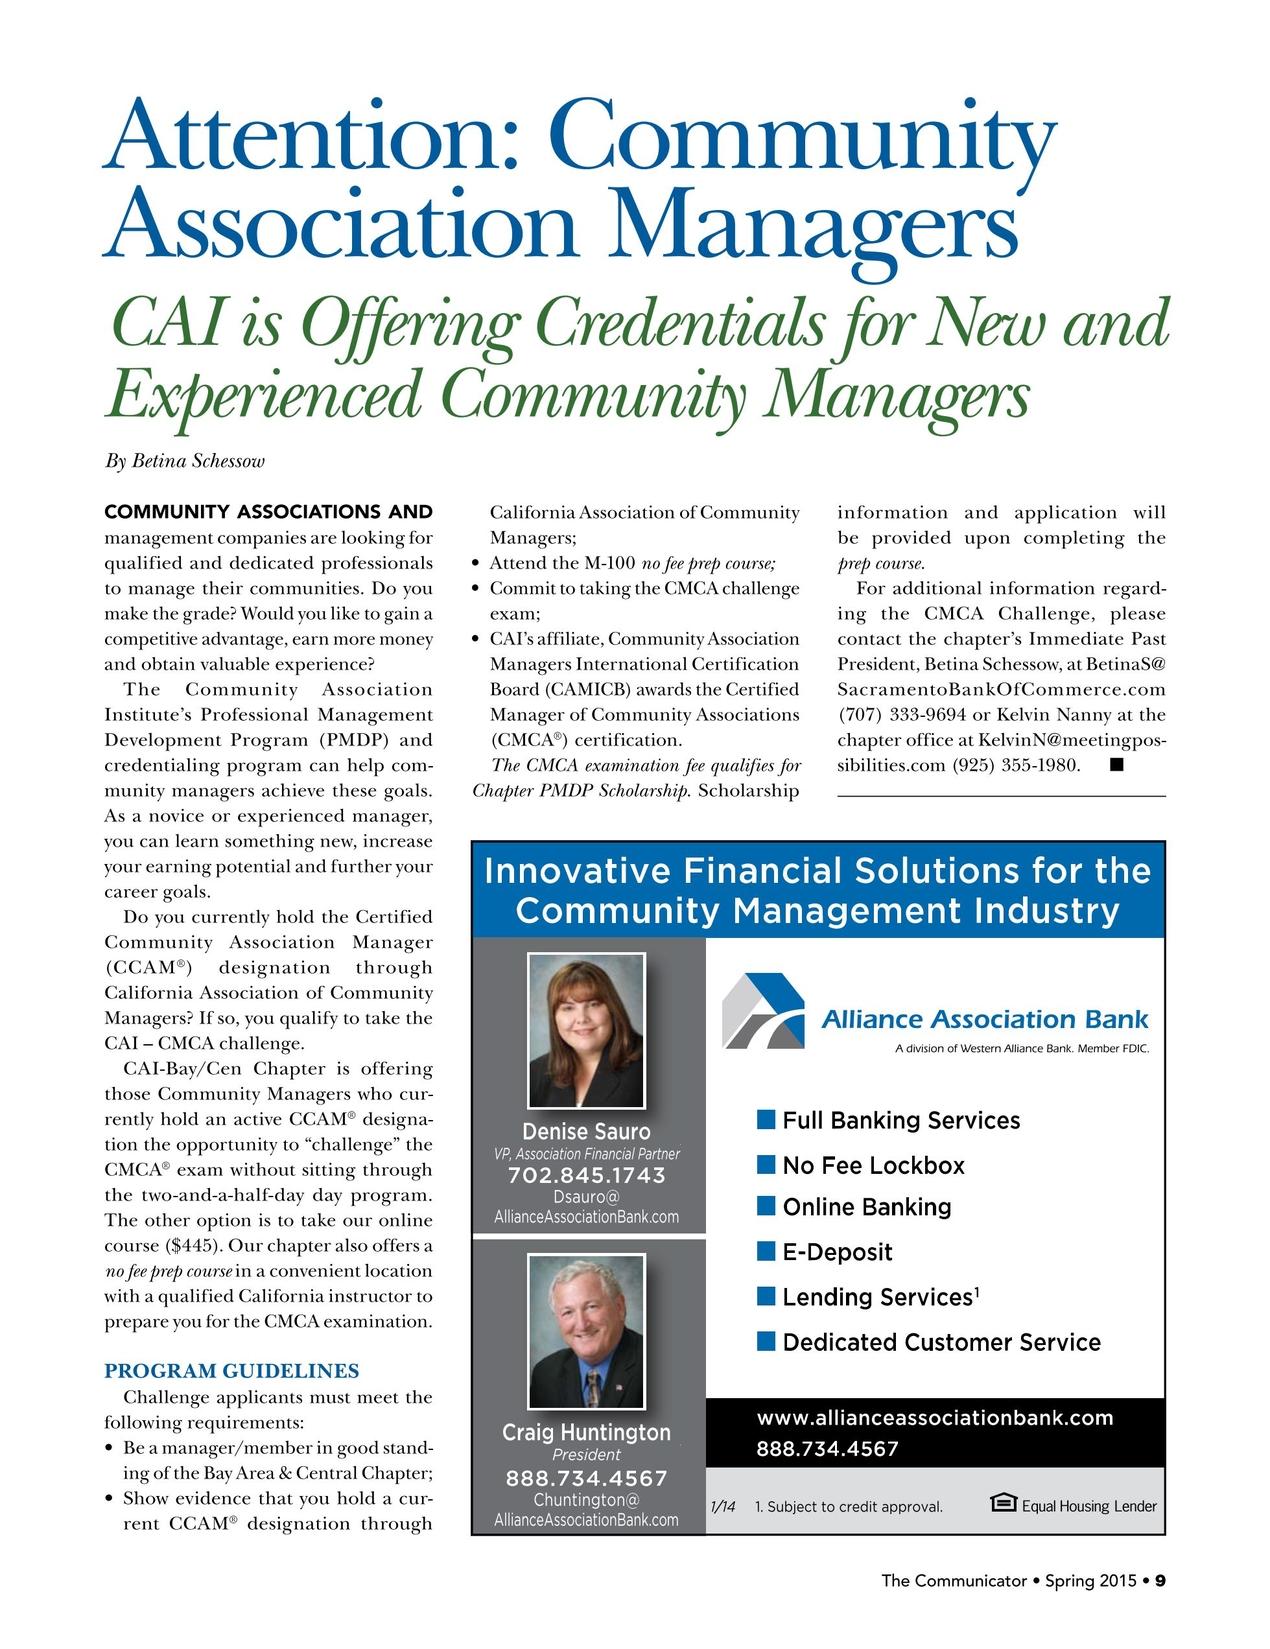 The Communicator Volume 8 Issue 2